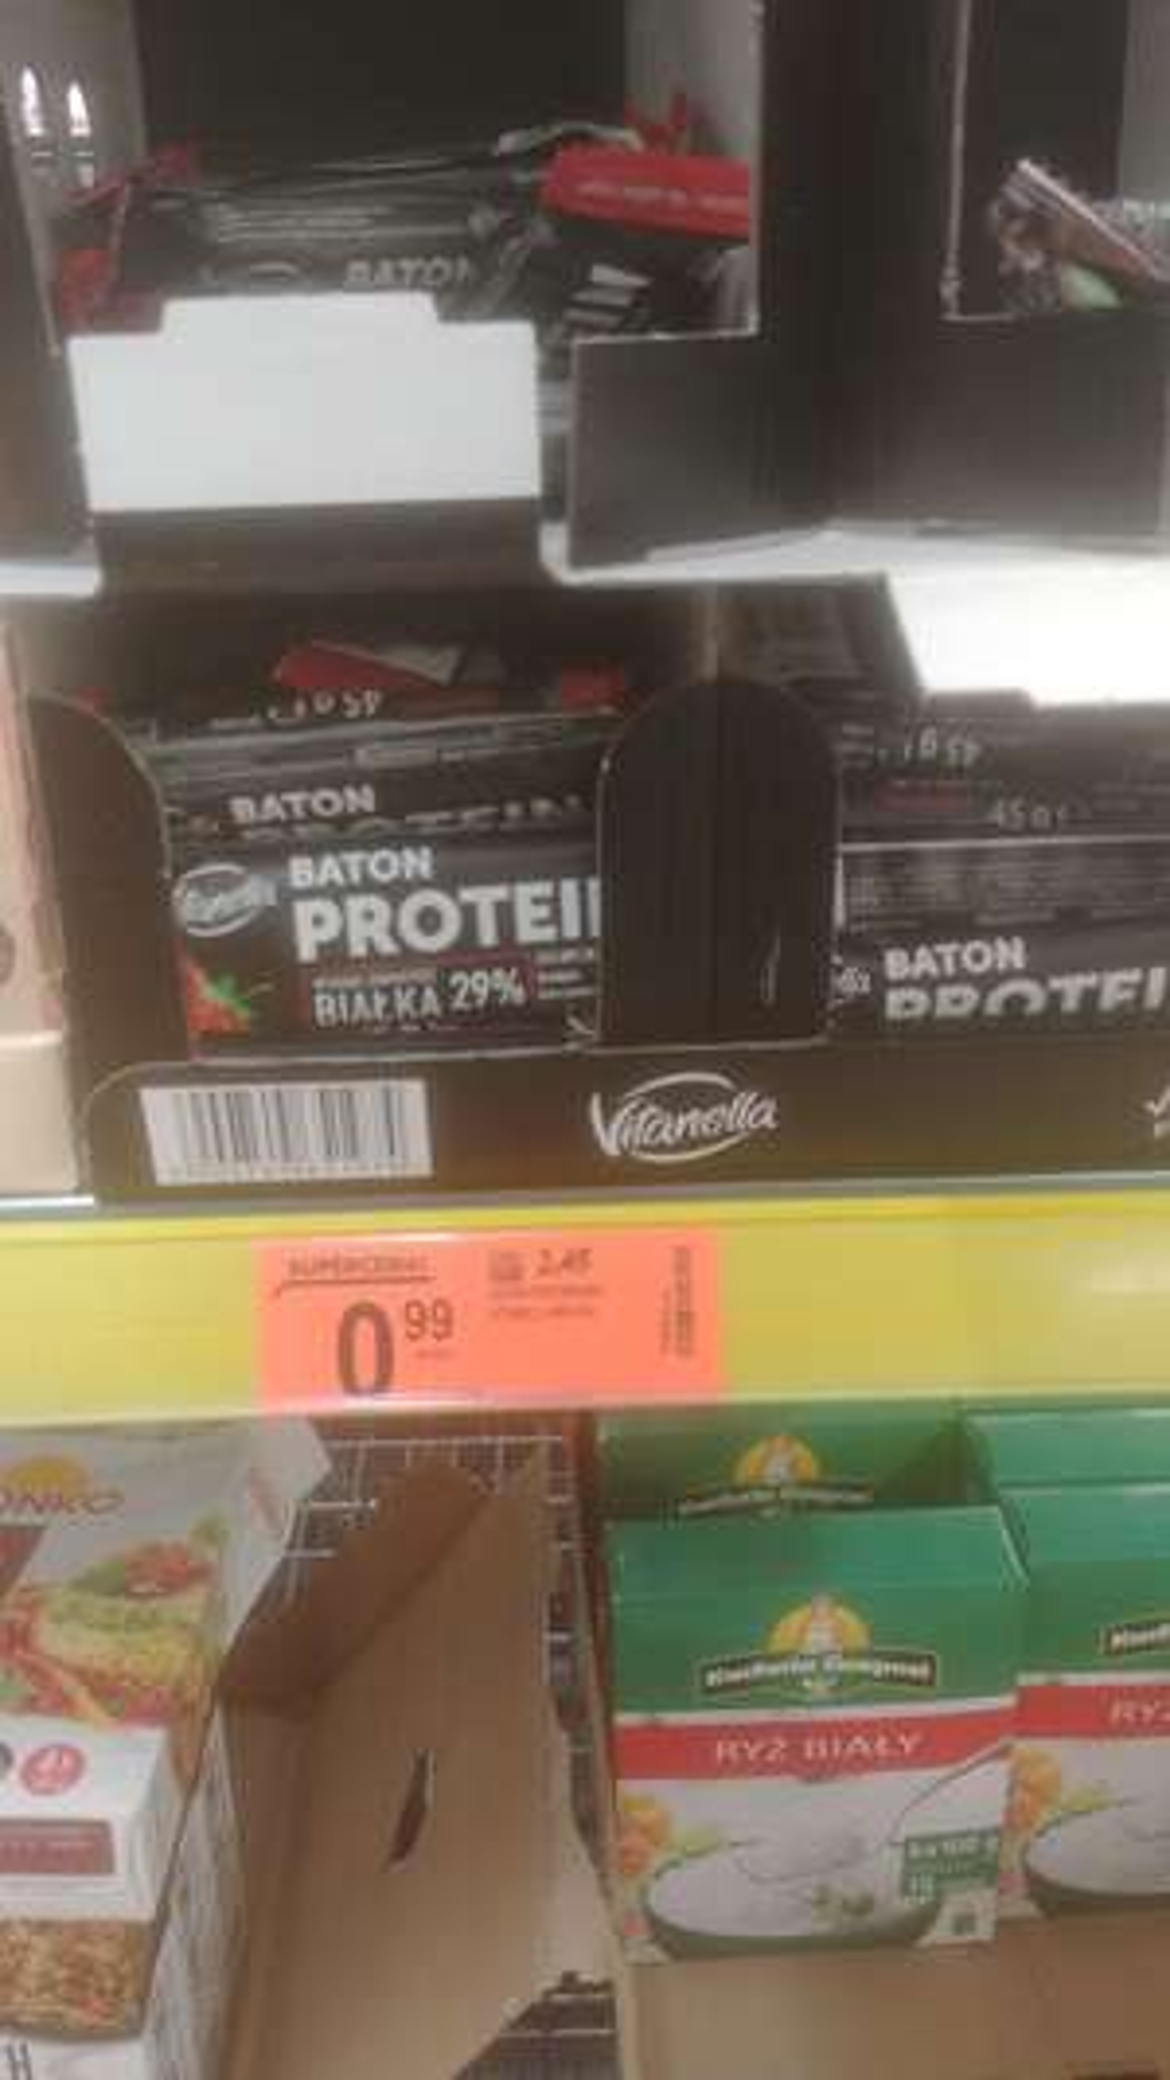 Baton proteinowy Vitanella Radom Biedronka